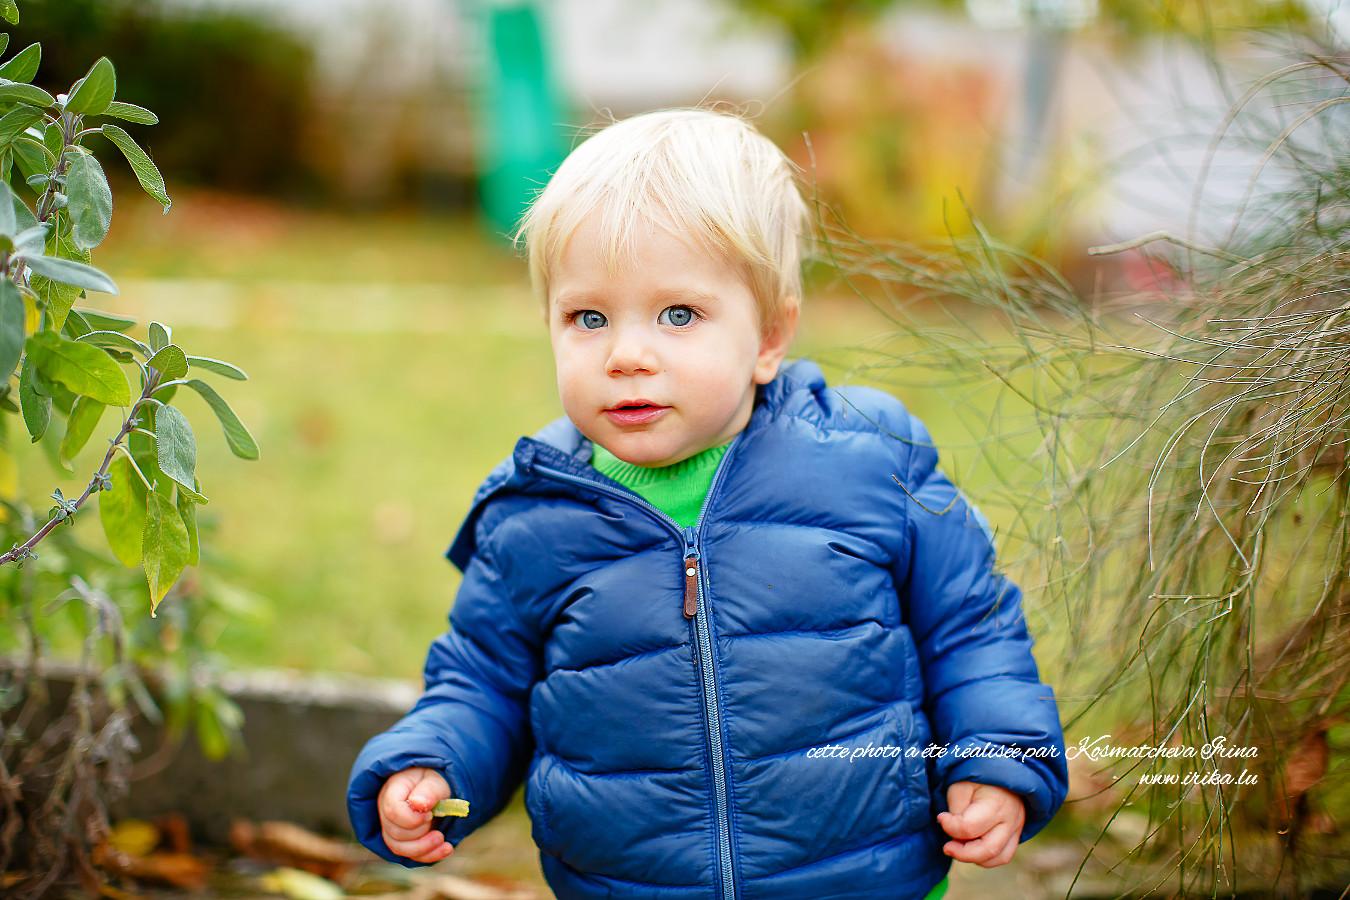 Petit Tobias